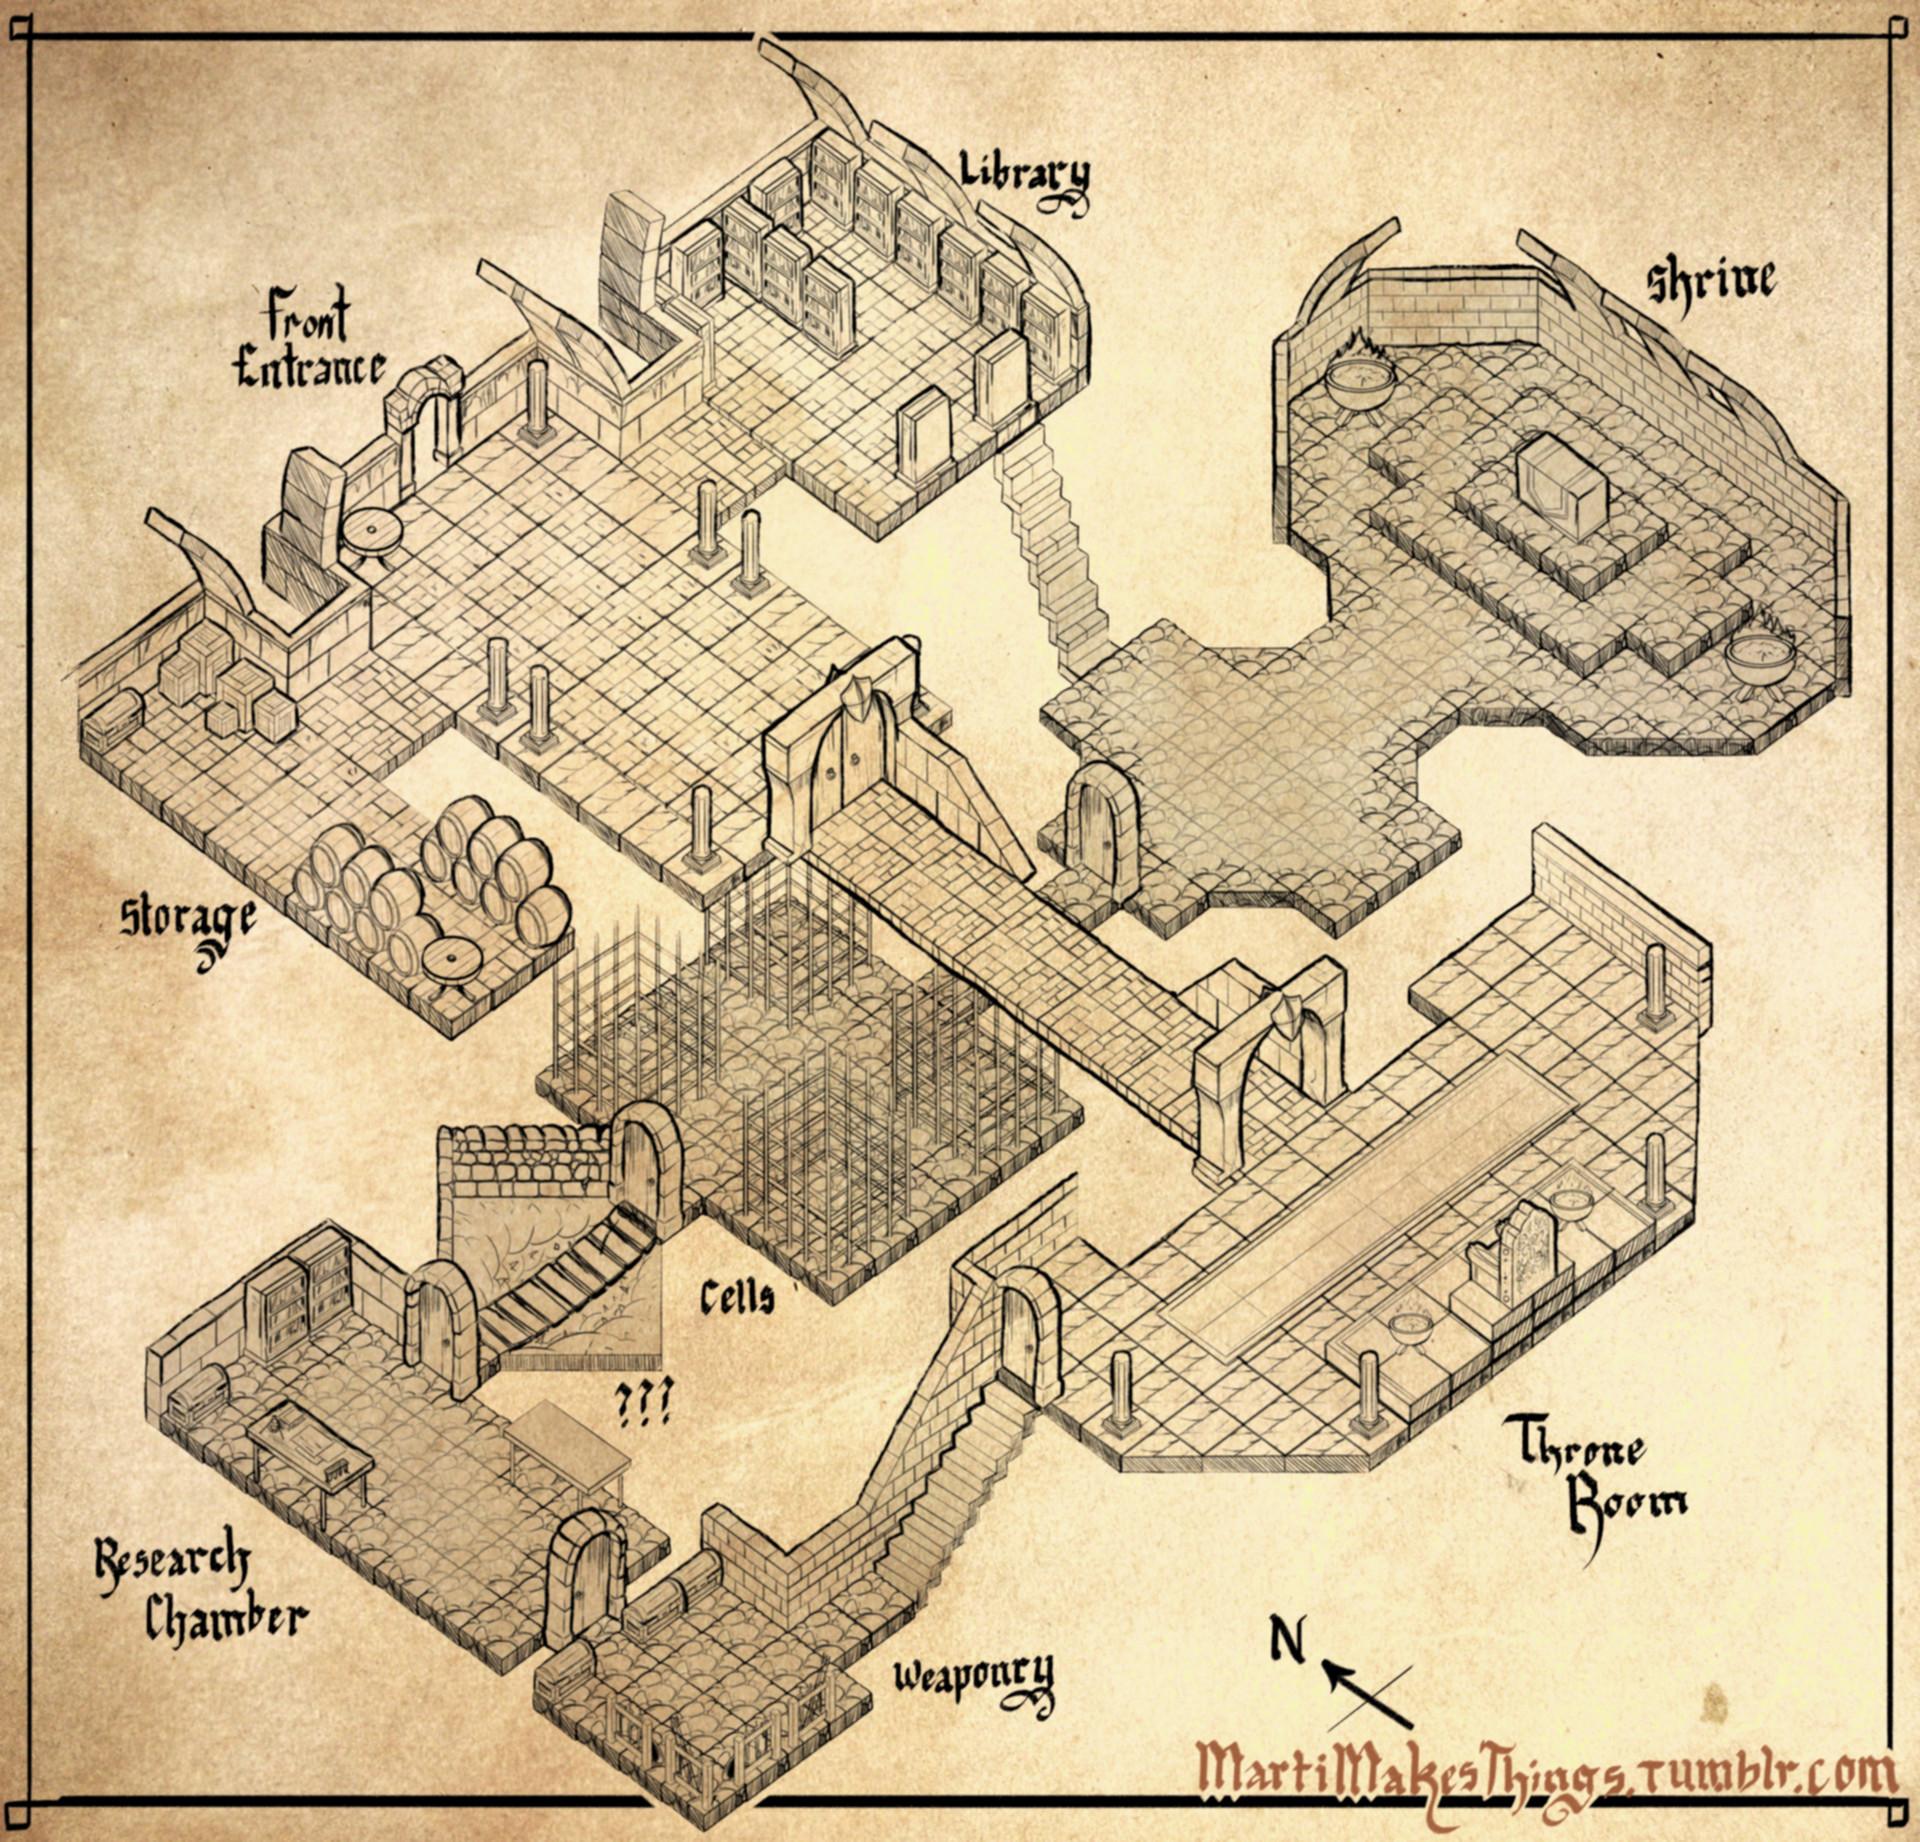 ArtStation - Isometric Dungeon Design, Martin Whitfield